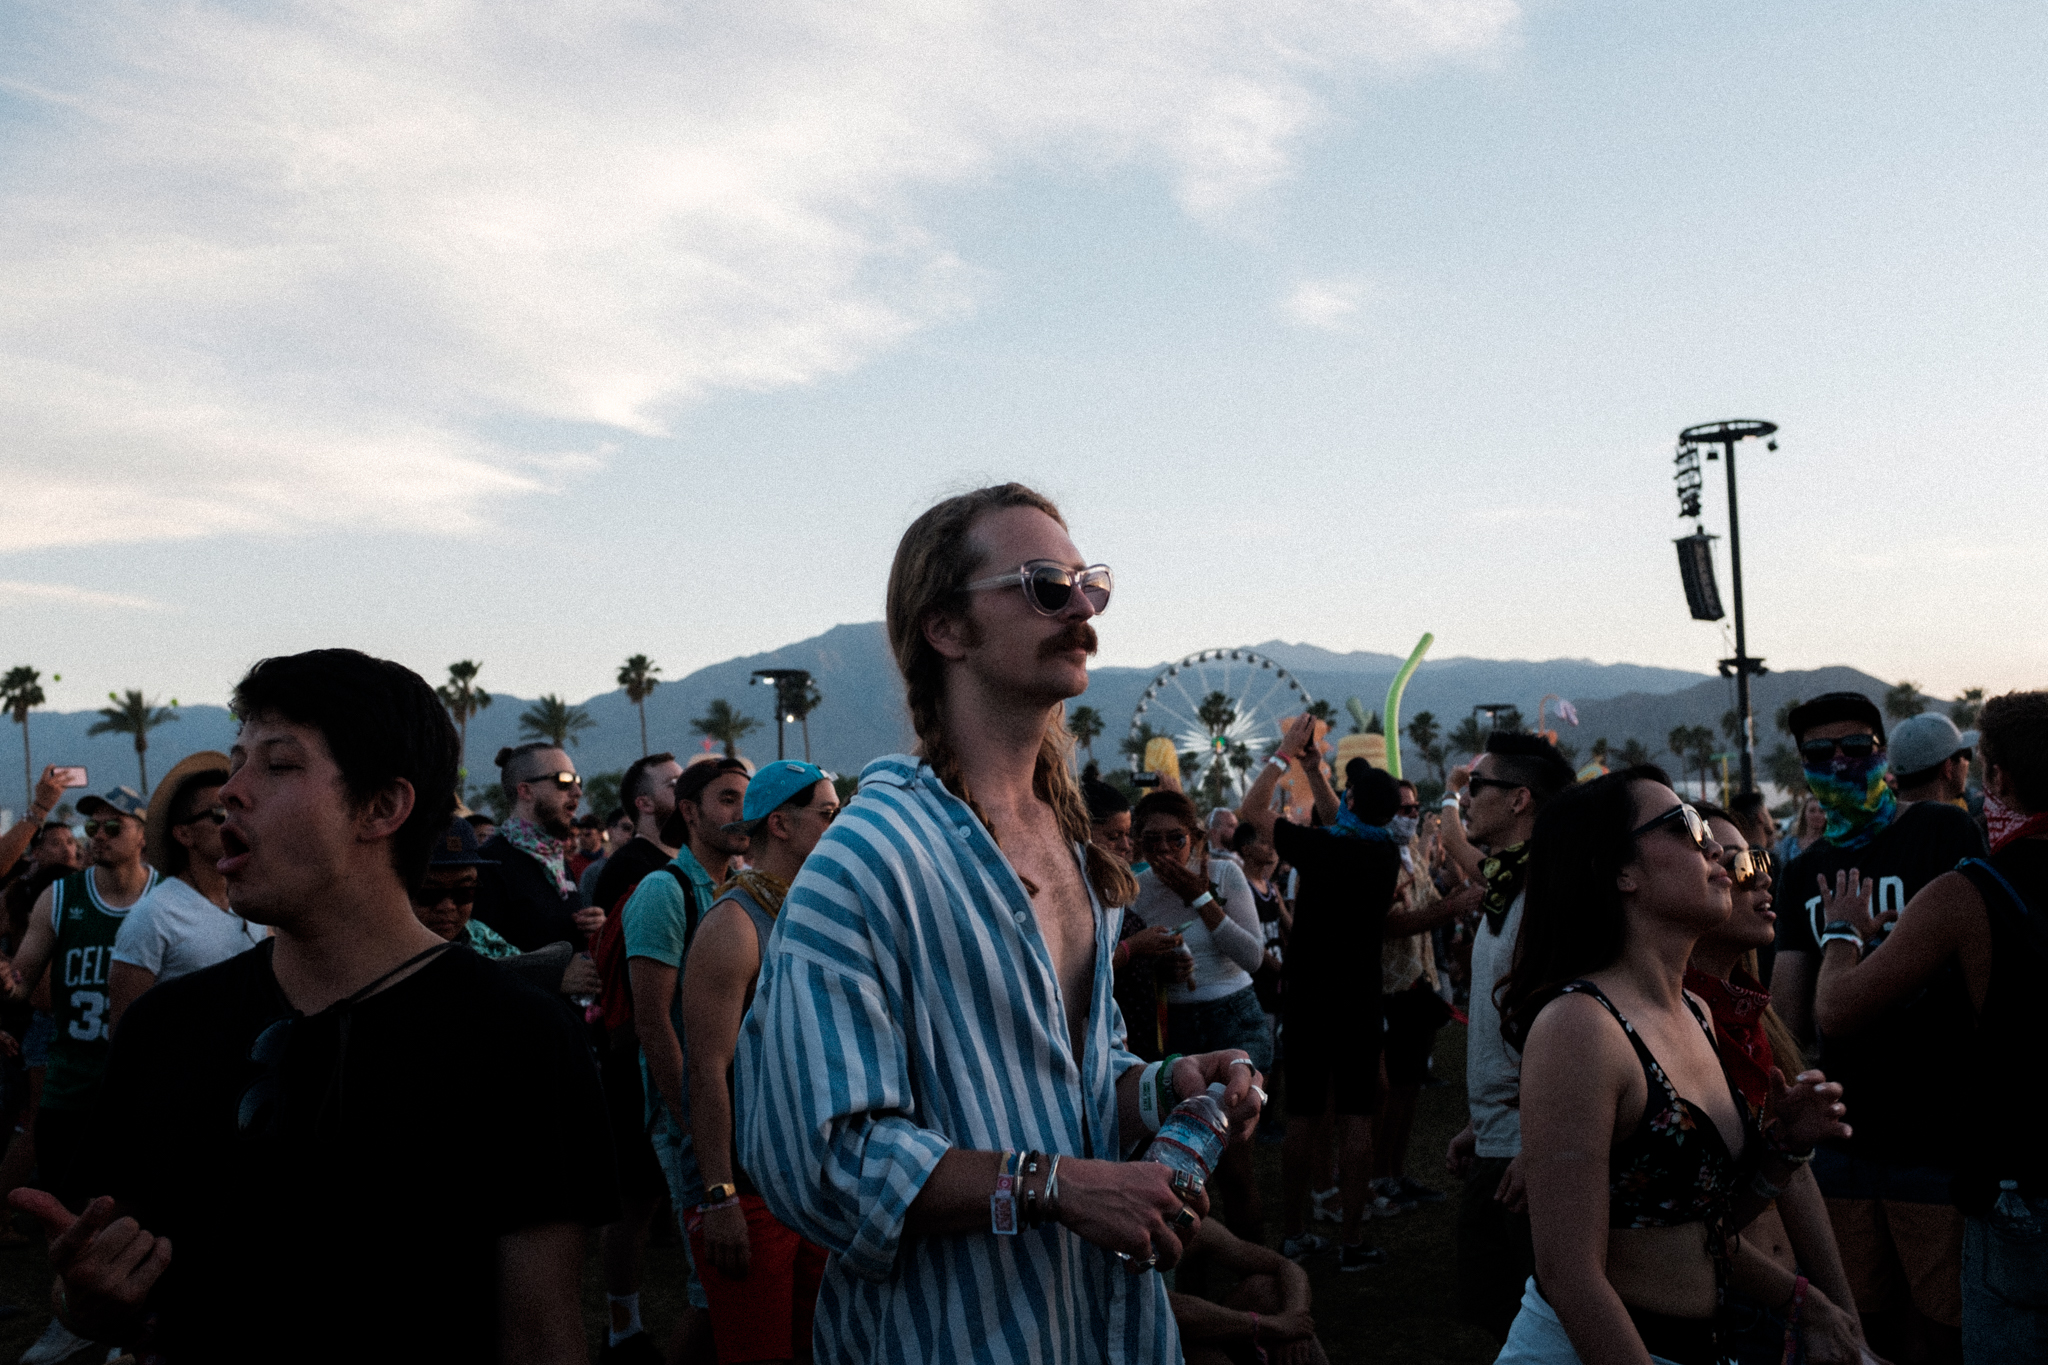 170423 Coachella 17 w2 2040.jpg